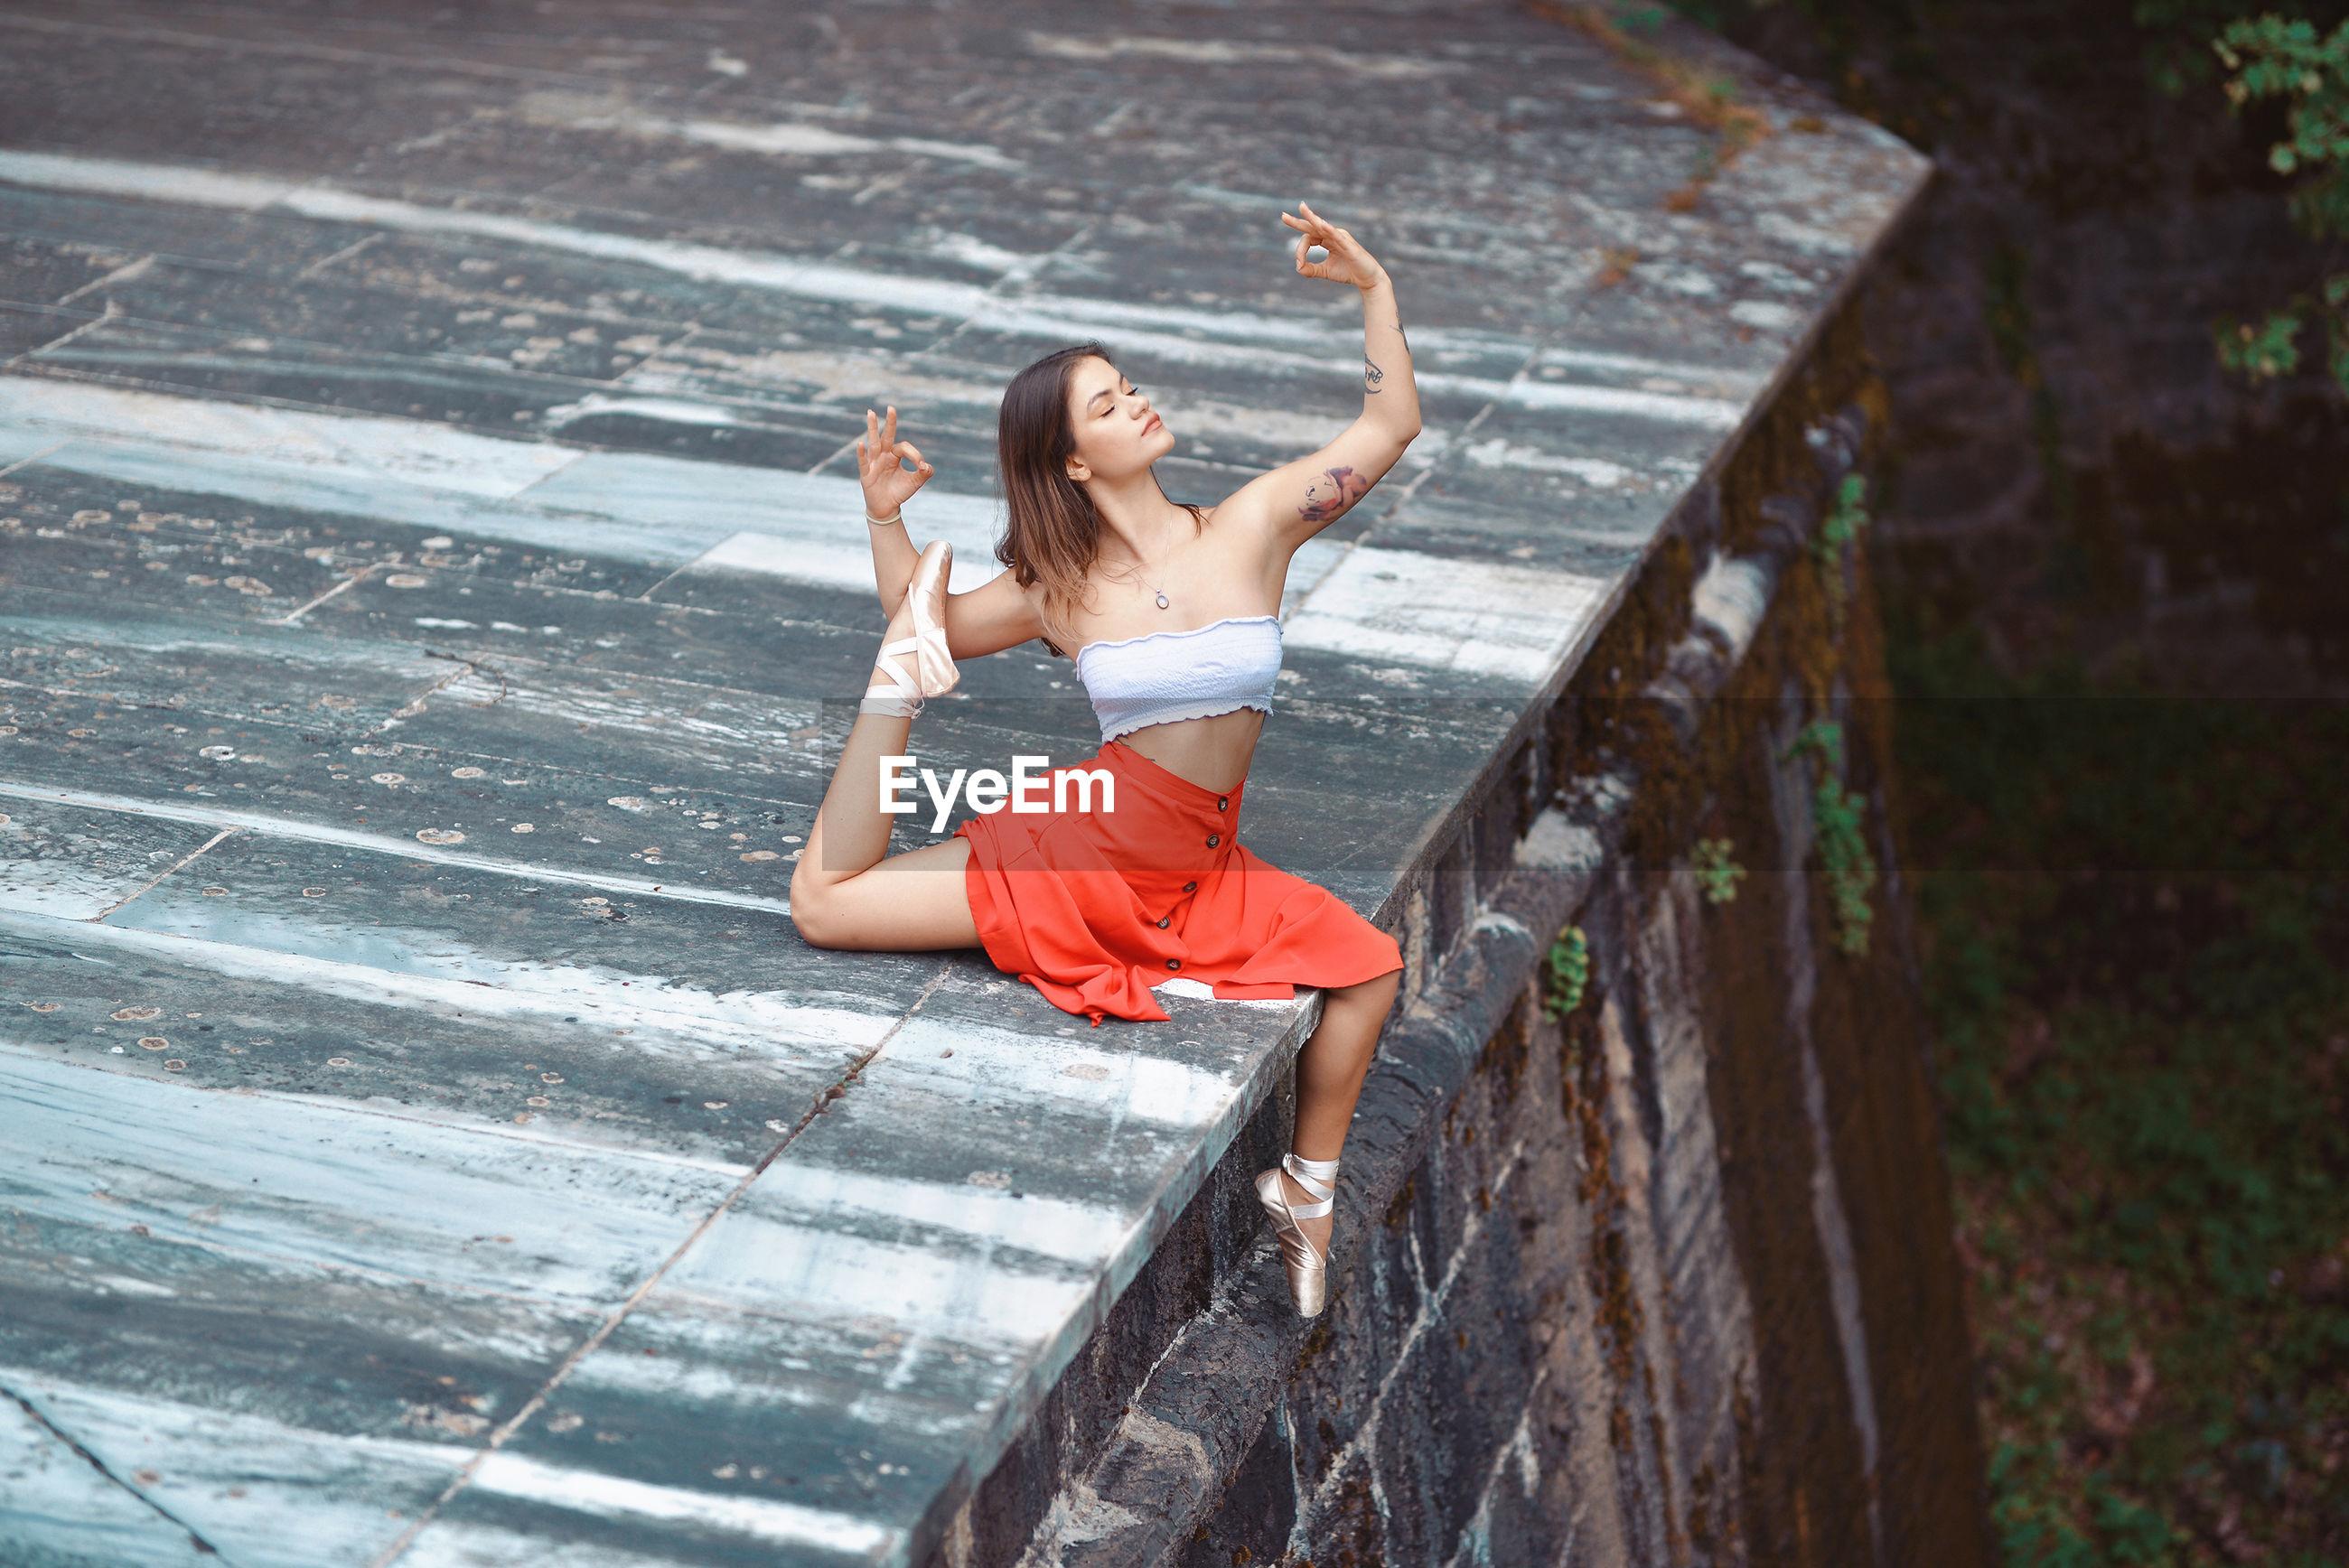 Young woman dancing outdoors